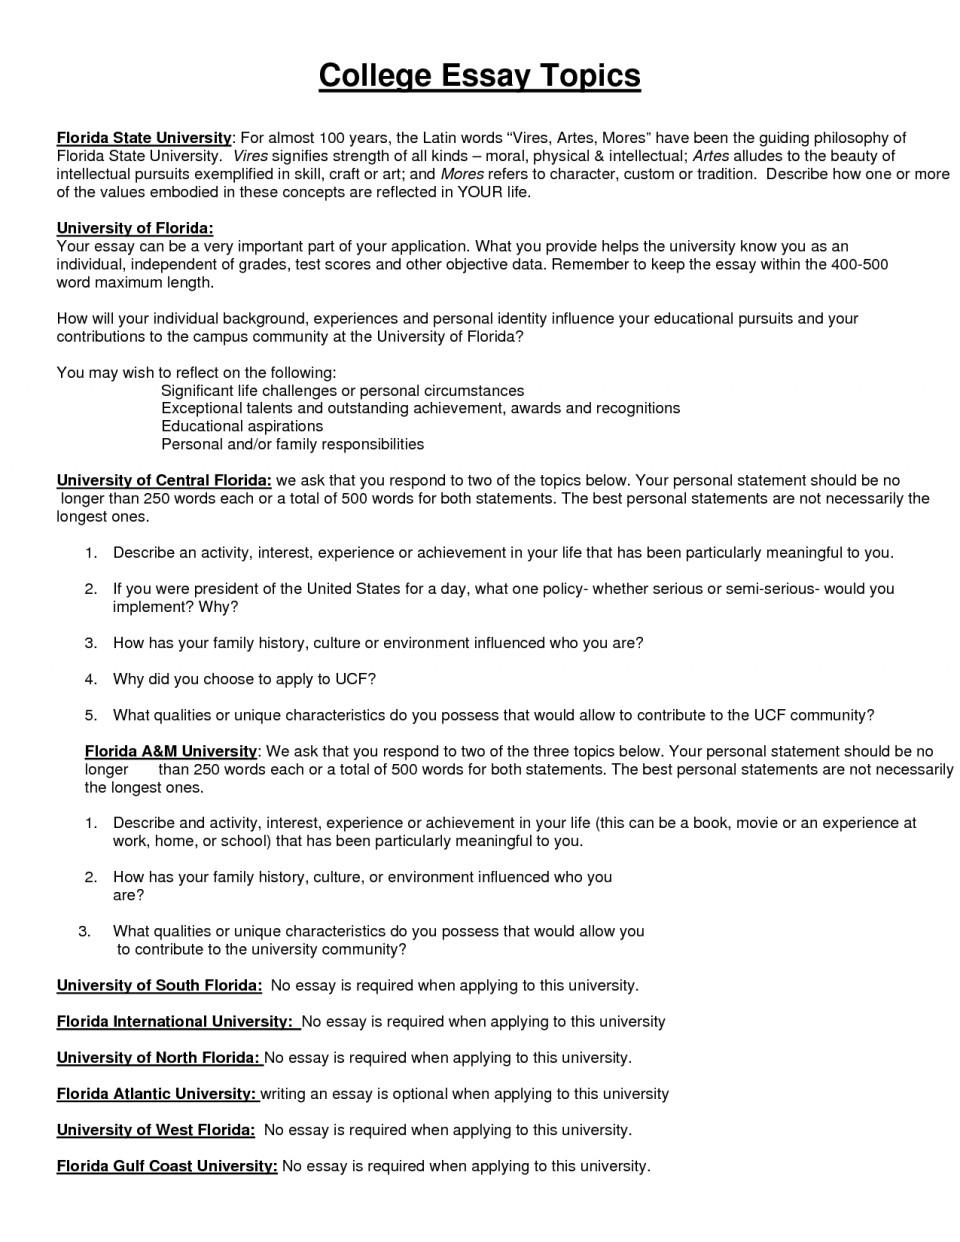 001 4khqbt5dlt Good Topics For College Essays Essay Top Research Best Prompts 960